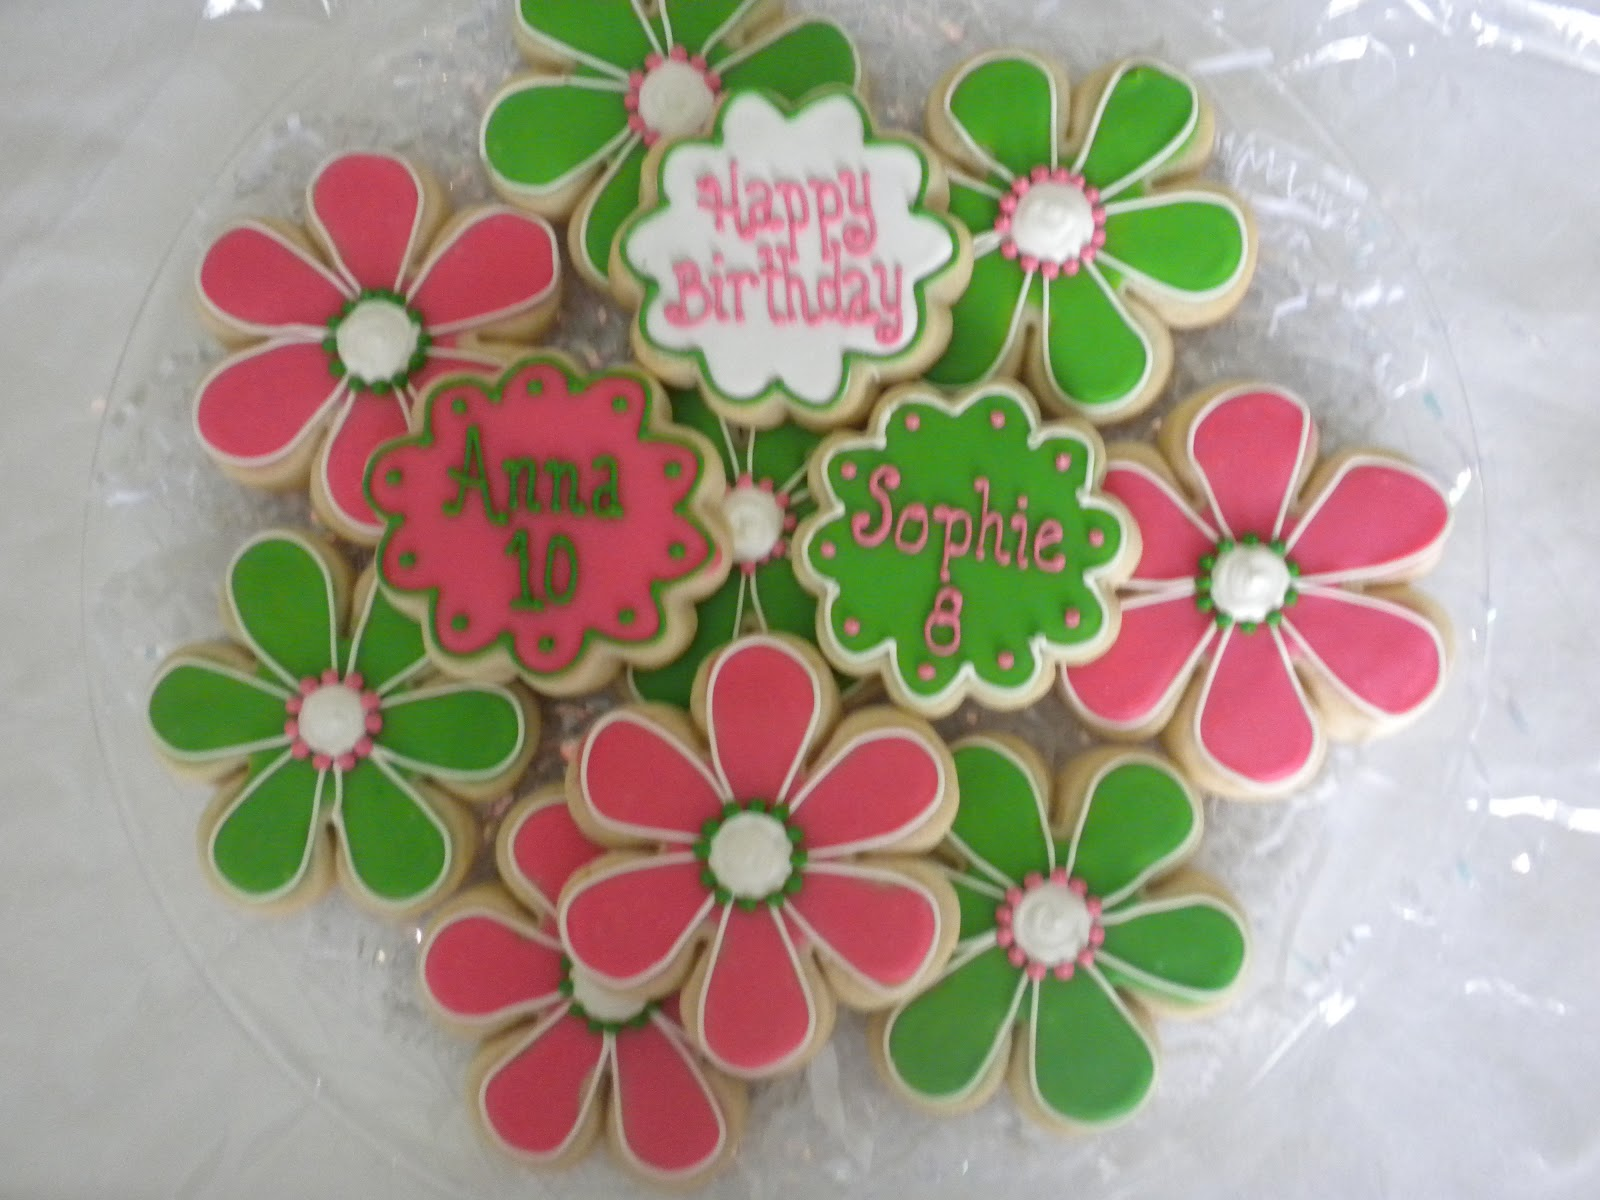 Adorable creations by dori happy birthday flower power happy birthday flower power izmirmasajfo